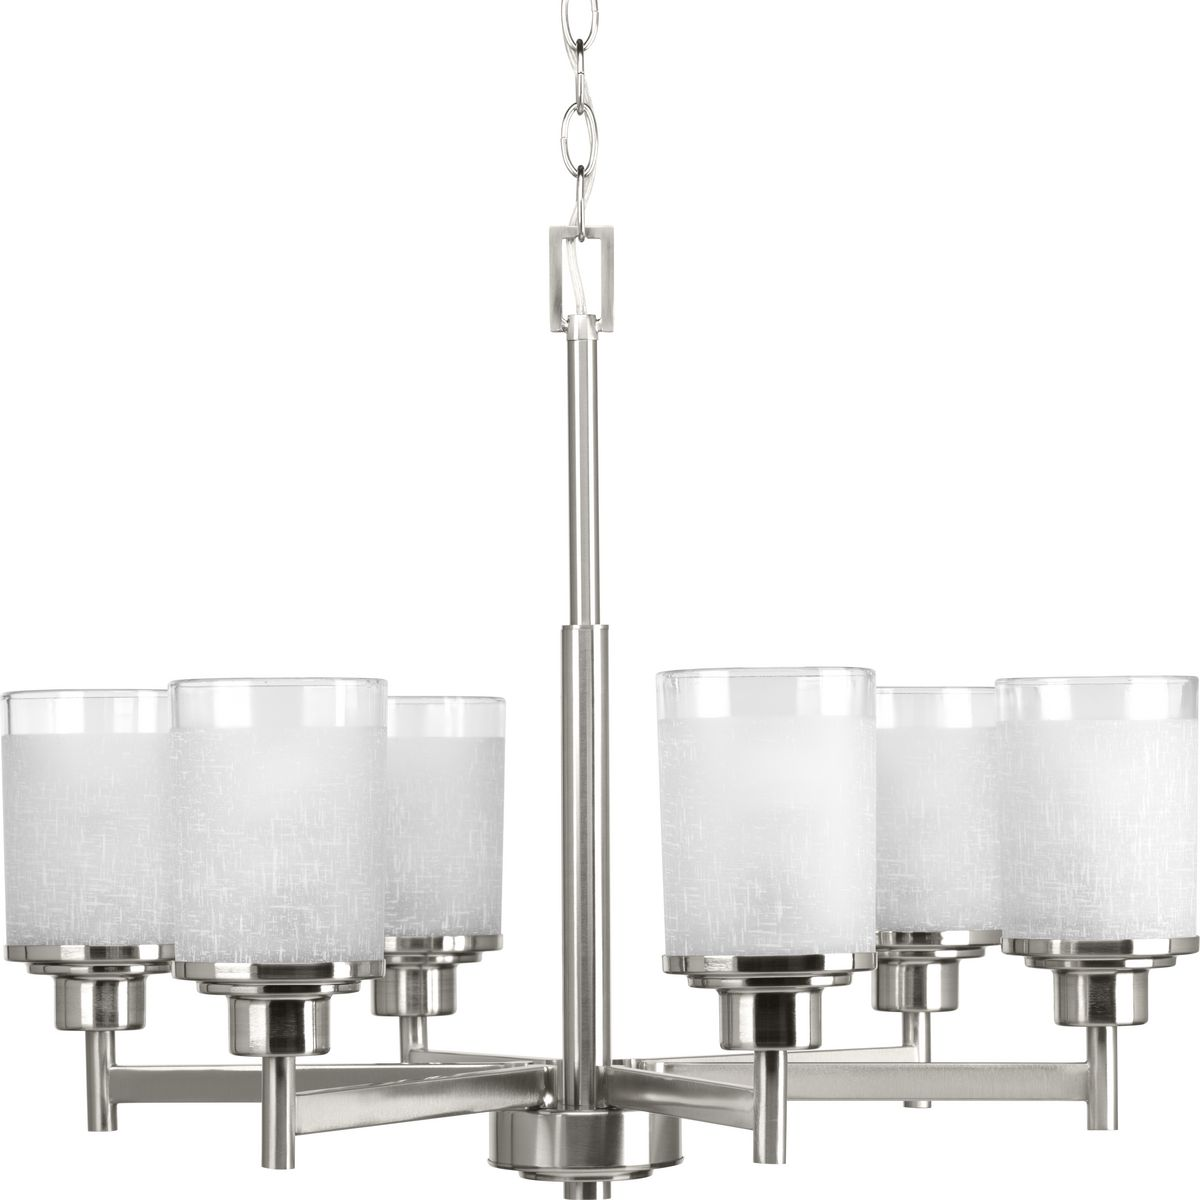 Alexa Collection Six Light Chandelier Brand Hubbell Parts Diagram What Make Up A Prog P4758 09 Prodimage Glass 2 Detailshot Finish 1 Bath Img 2940